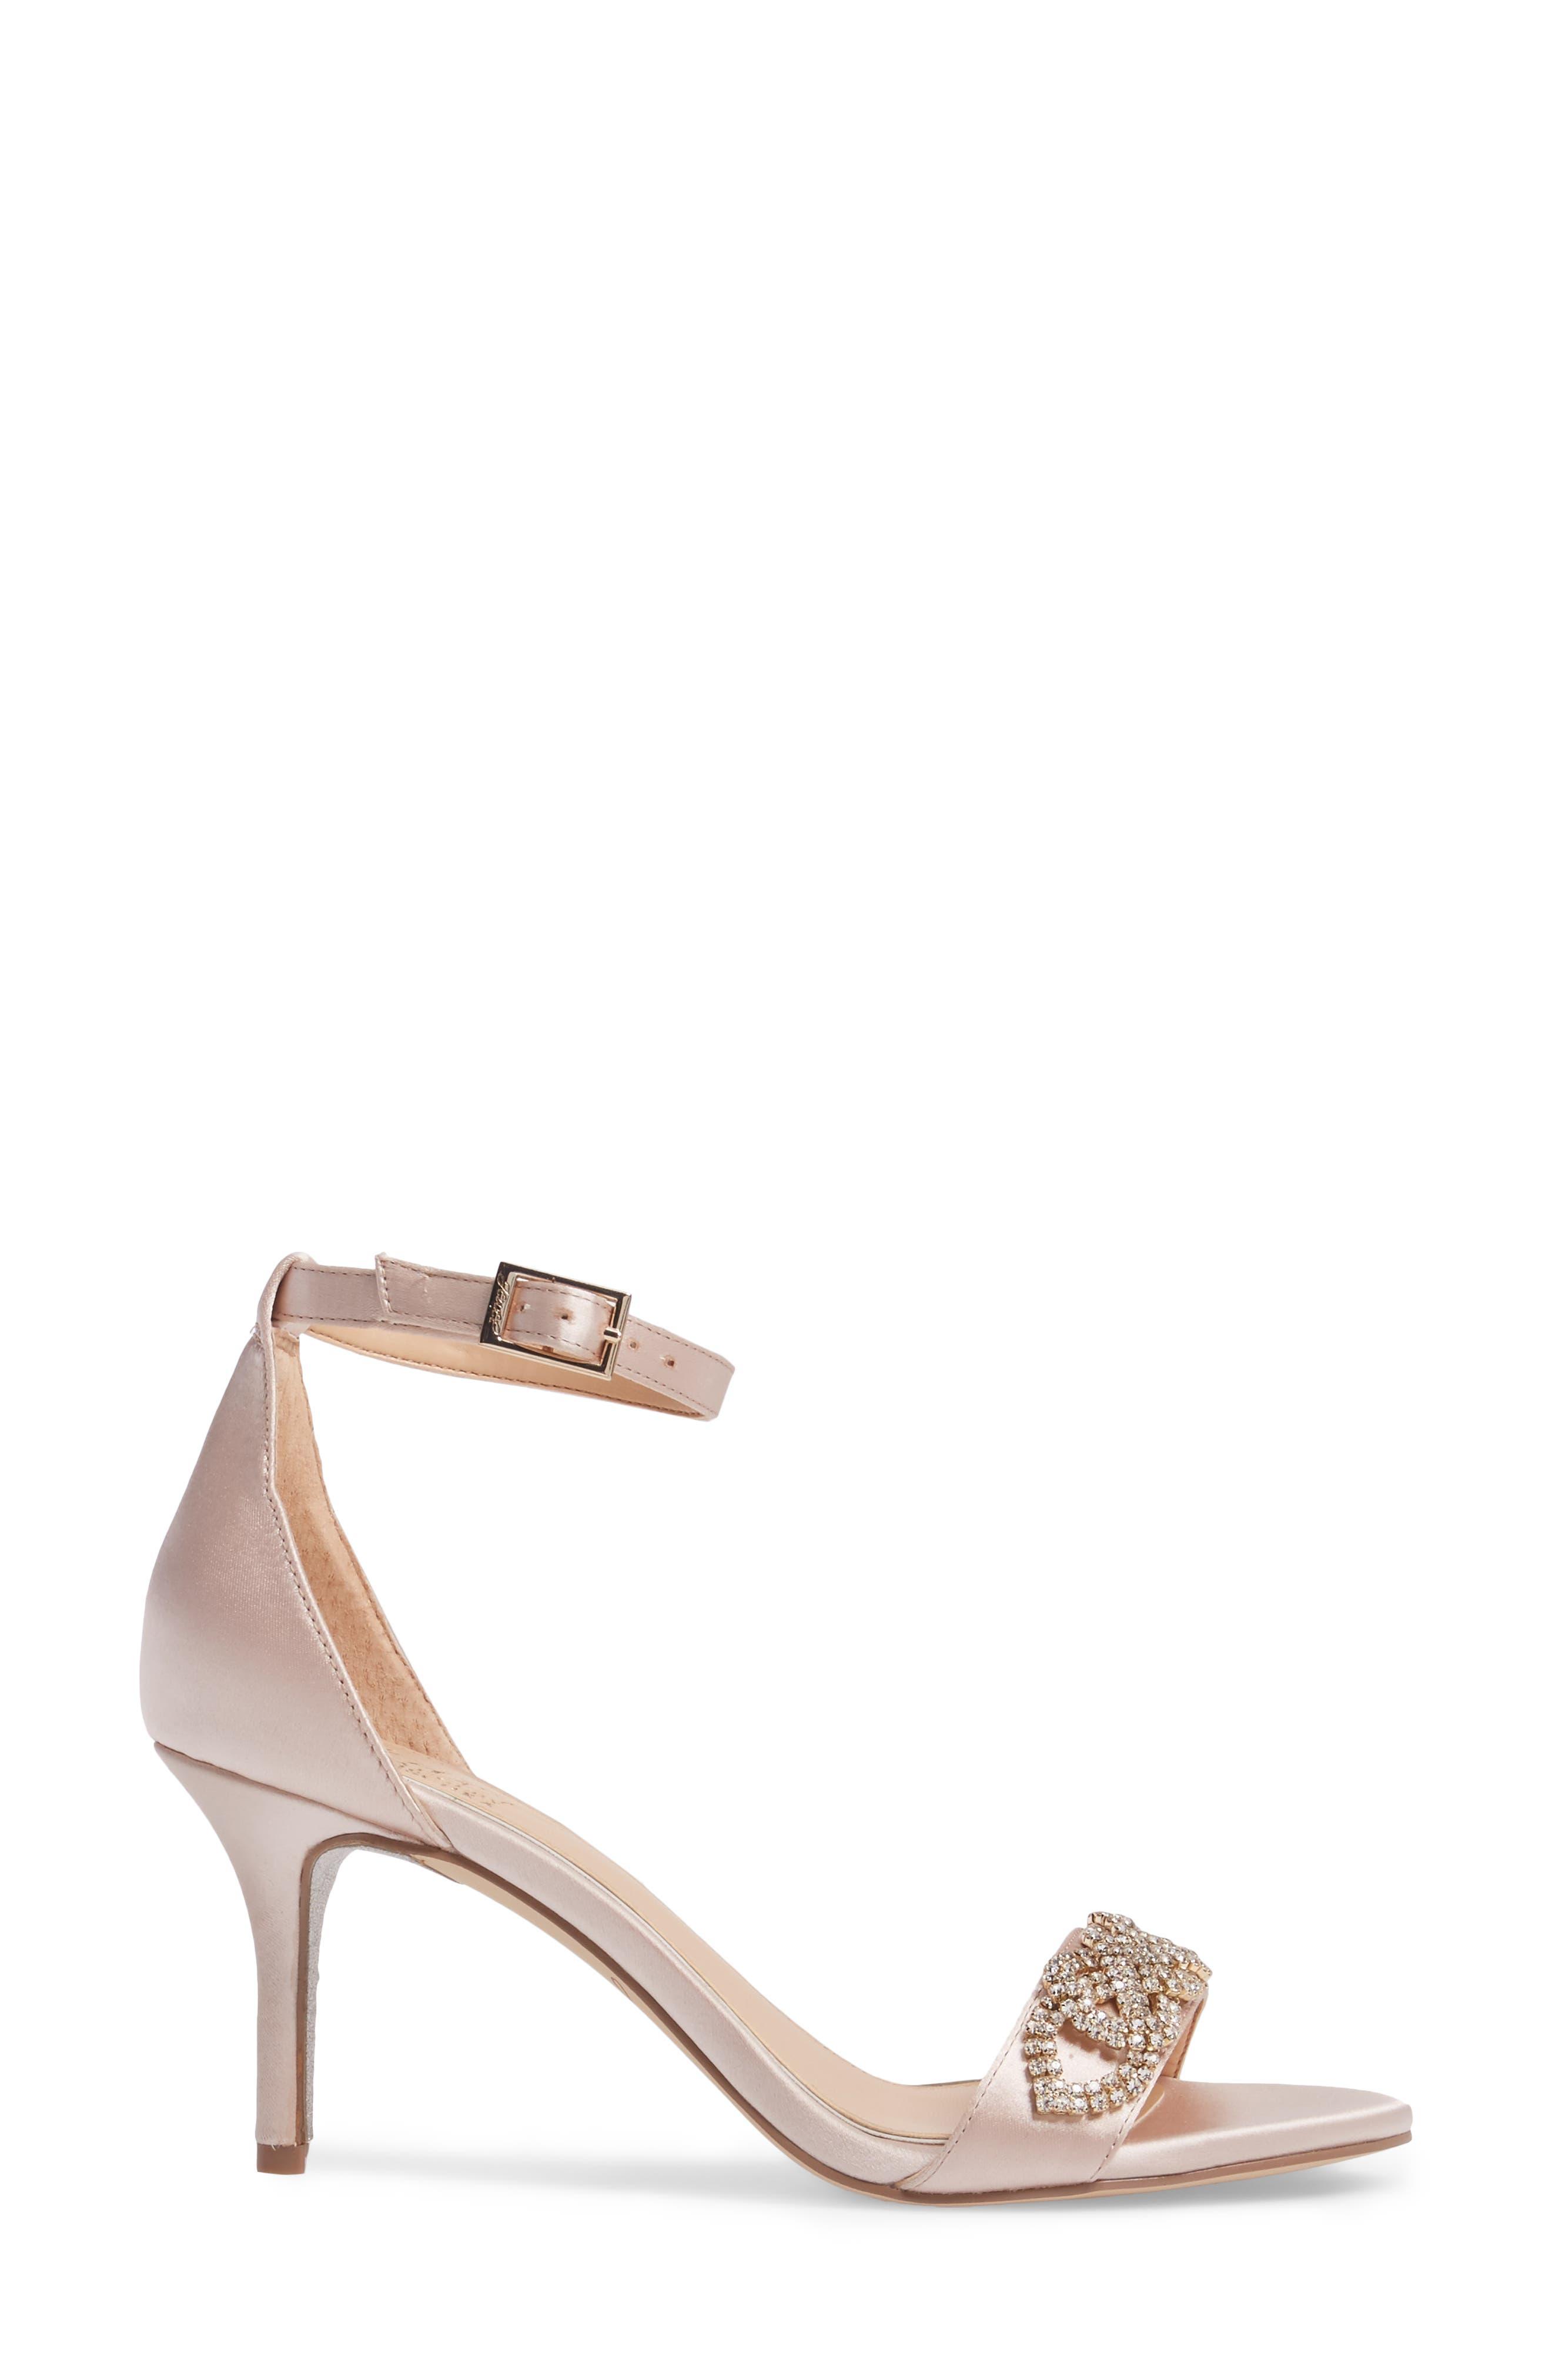 Alana Ankle Strap Sandal,                             Alternate thumbnail 3, color,                             Champagne Satin